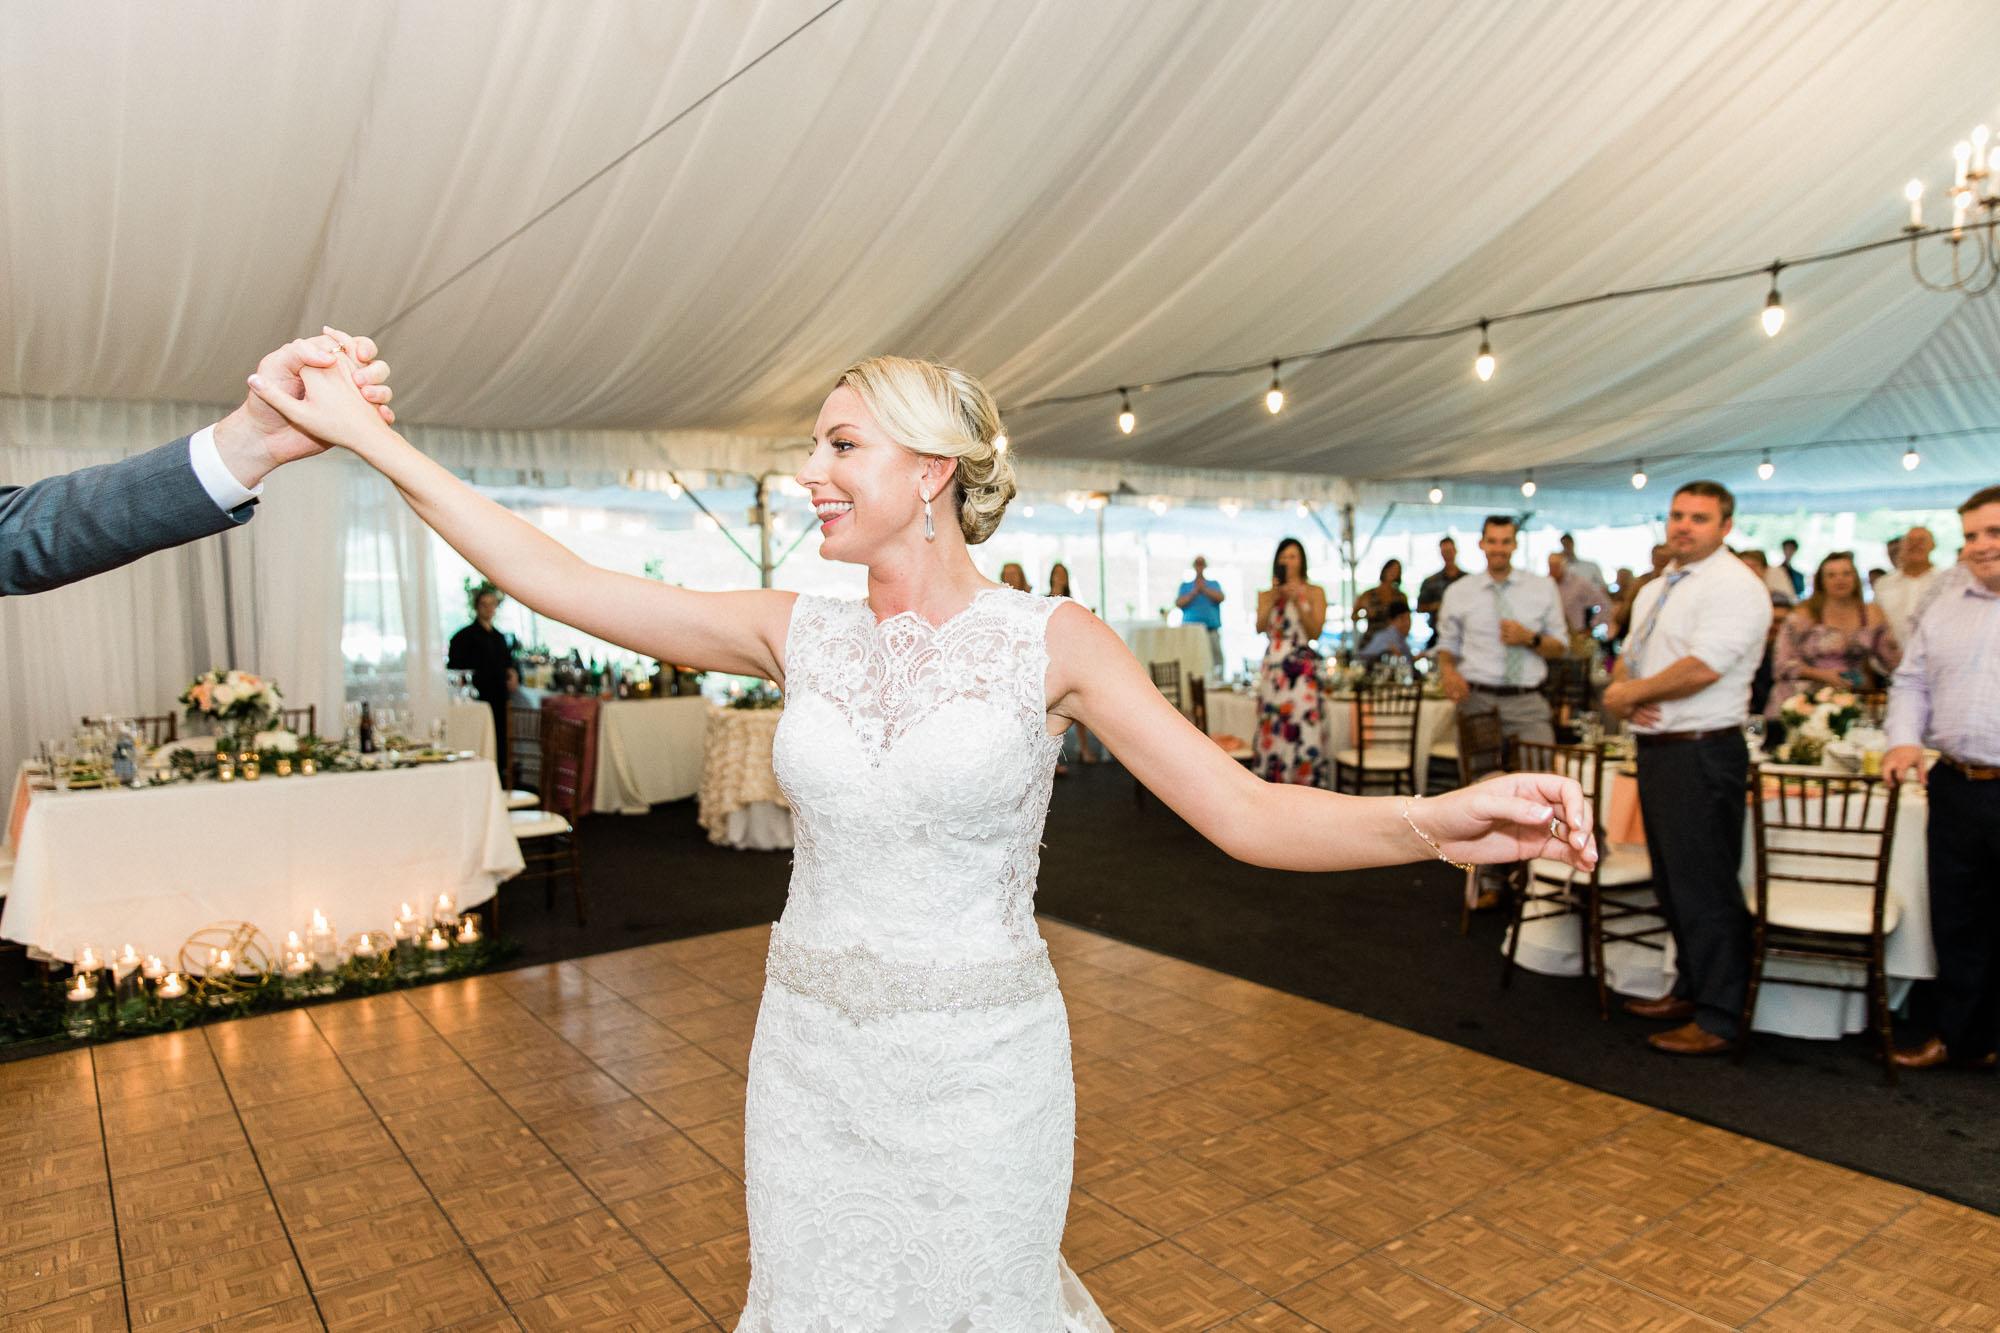 Allenberry-resort-historic-pennsylvania-wedding-10390.jpg